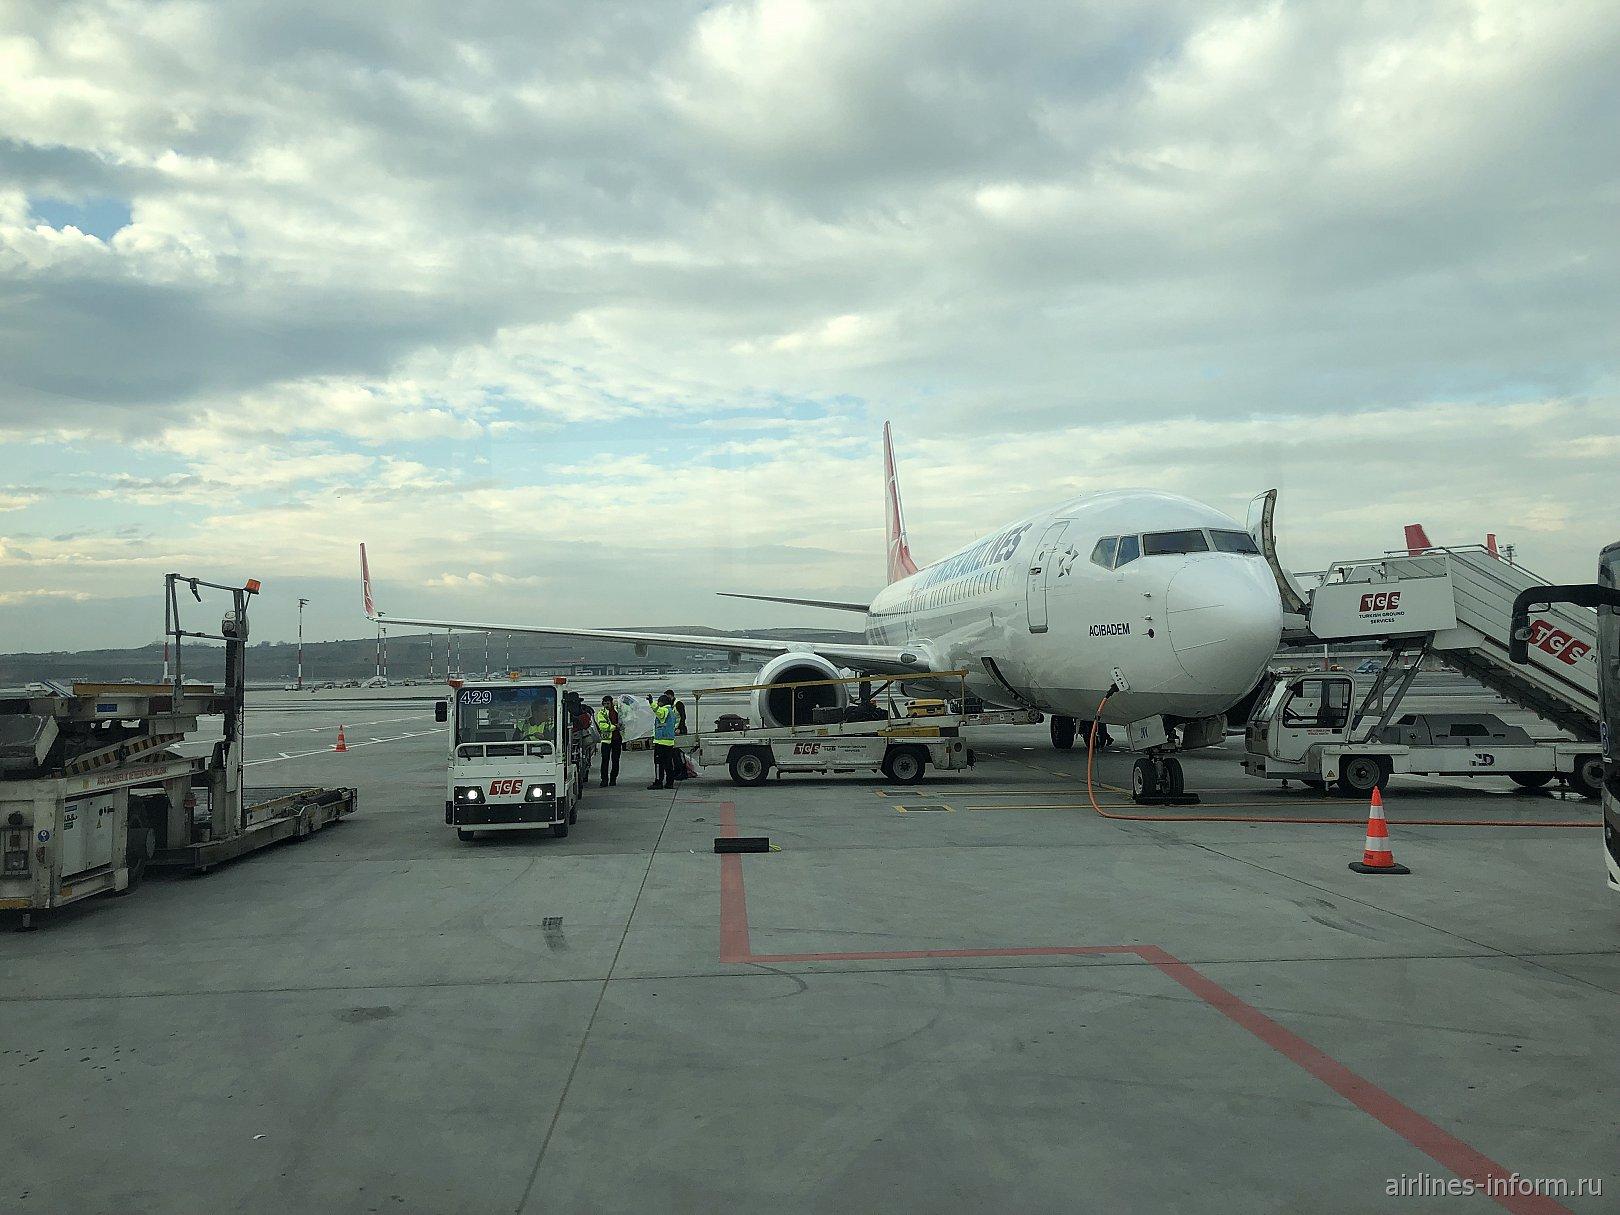 """Новый-Старый Шарм""  Шарм-эль-шейх-Стамбул  Turkish airlines B737-800"